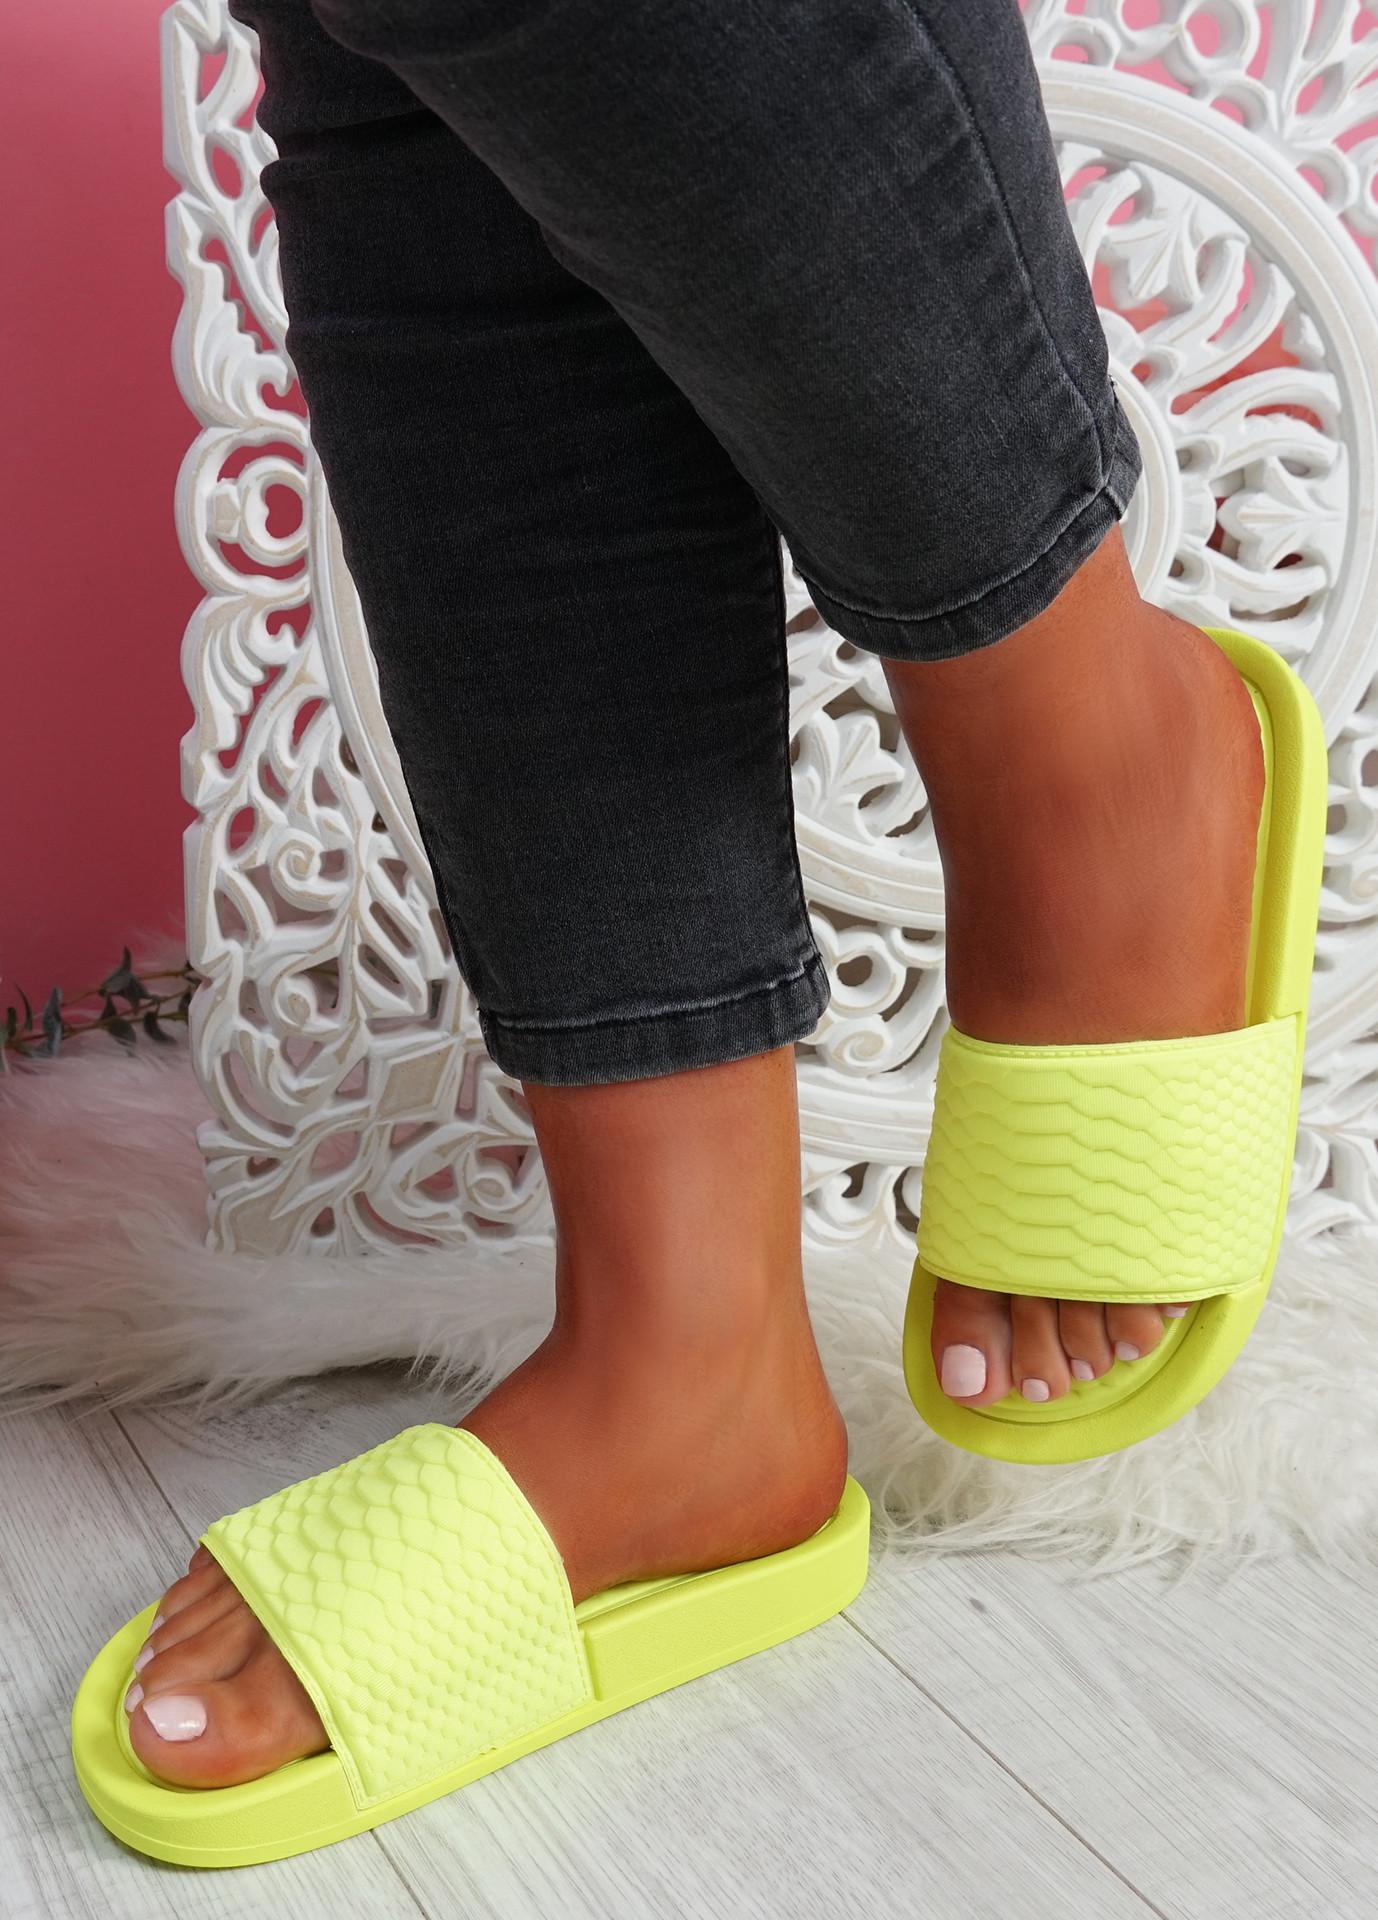 Soha Yellow Flat Sandals Sliders